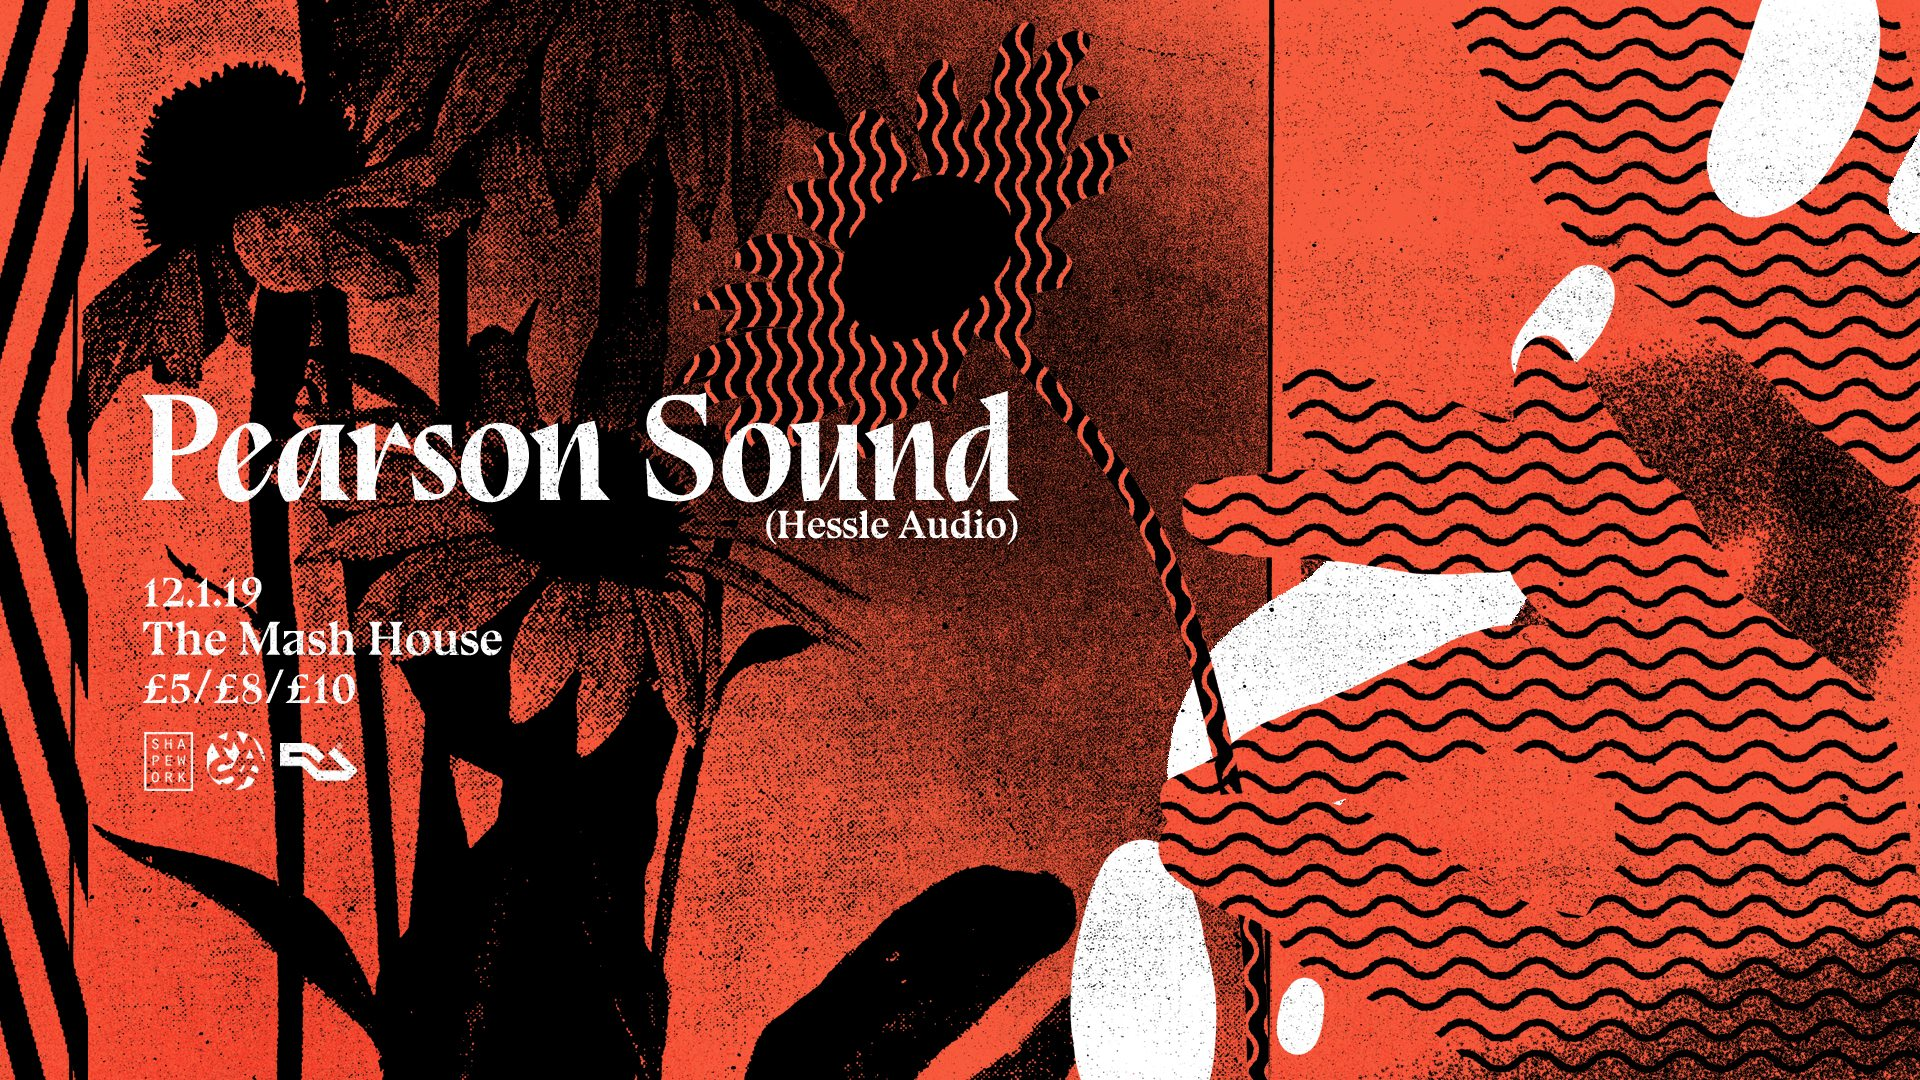 Shapework / Pearson Sound